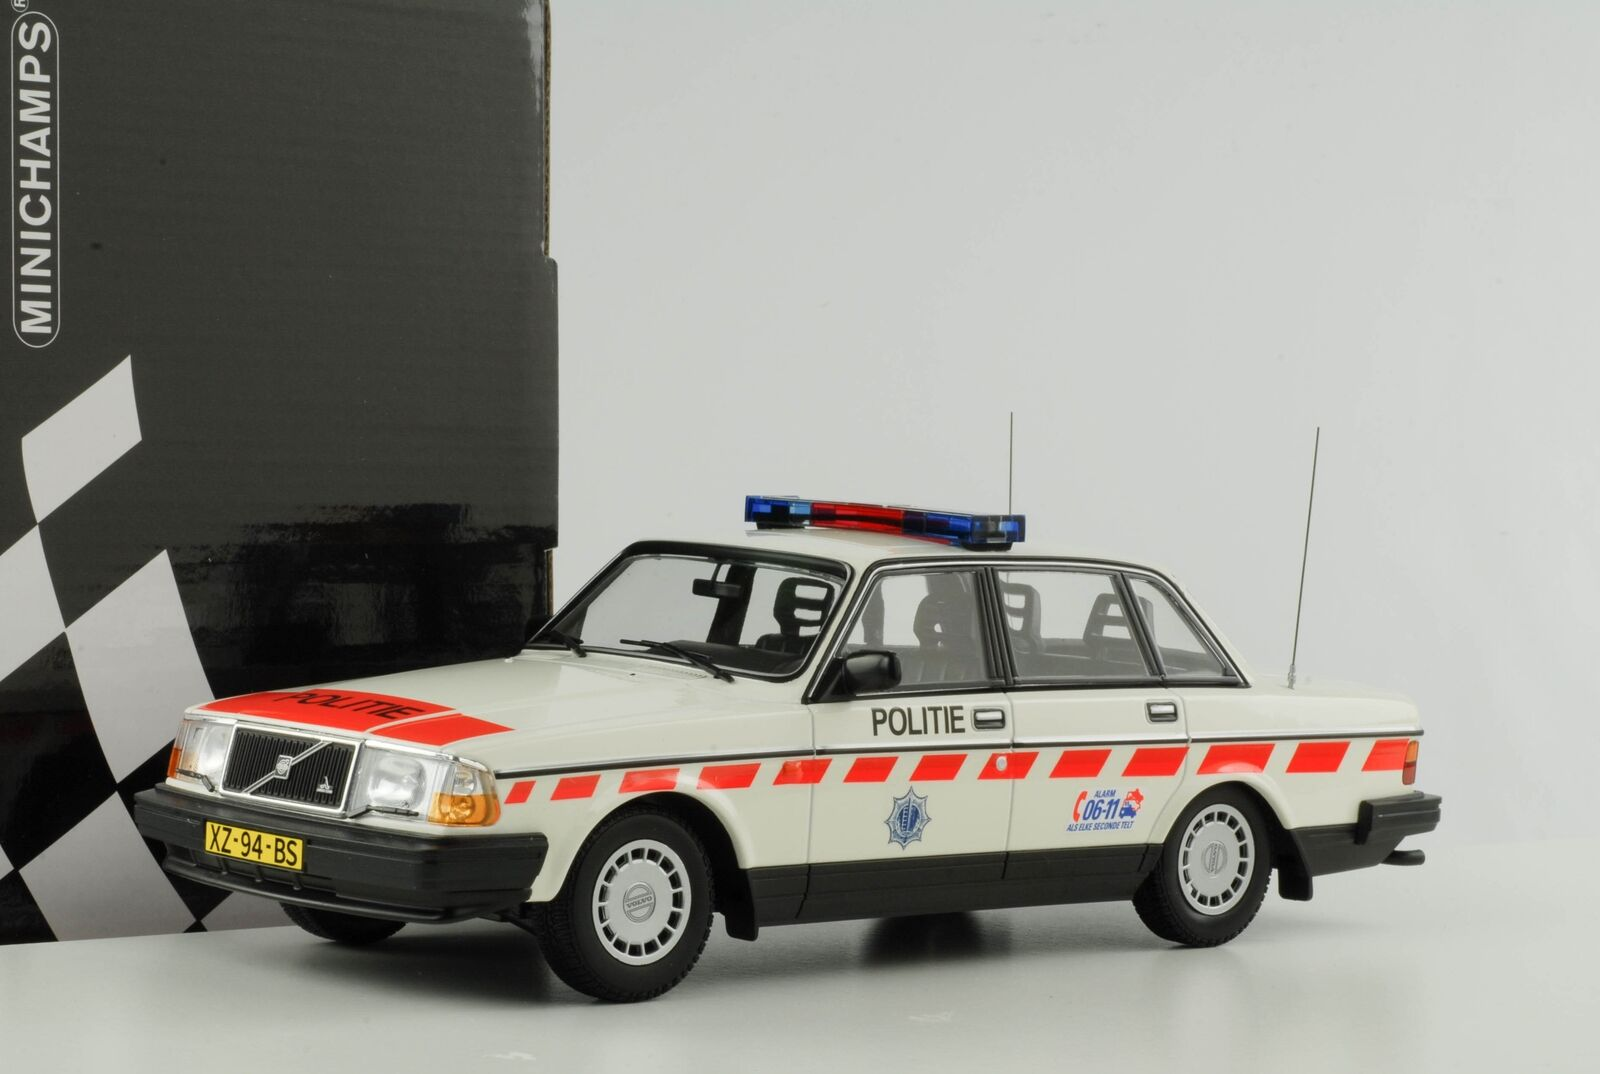 VOLVO 240gl 240 GL polizia militare Netherles polizia Polizia 1986 1 18 Minichamps Nuovo